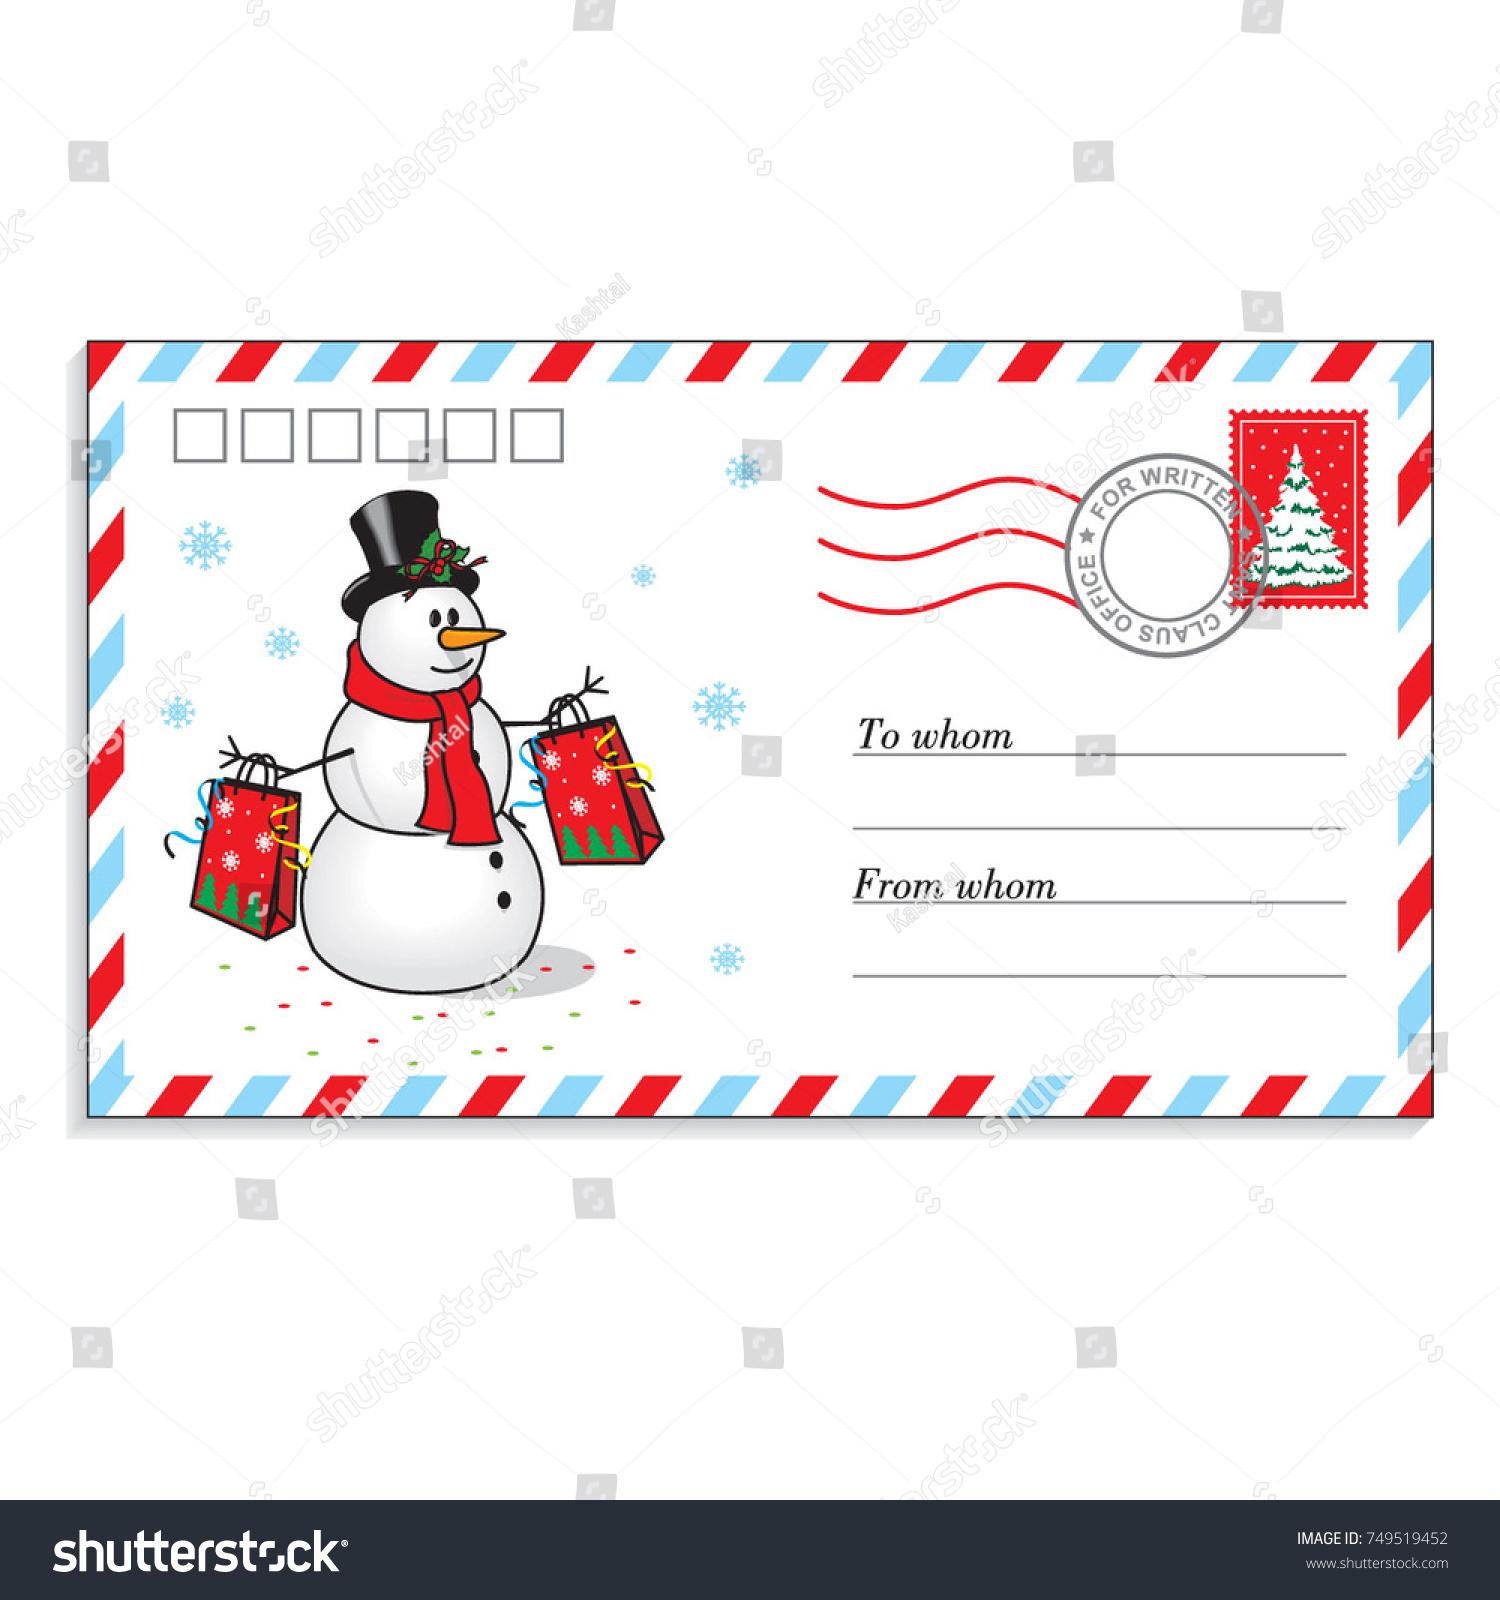 Christmas envelope cute snowman letter santa stock vector hd christmas envelope with cute snowman for the letter to santa claus vector illustration spiritdancerdesigns Gallery